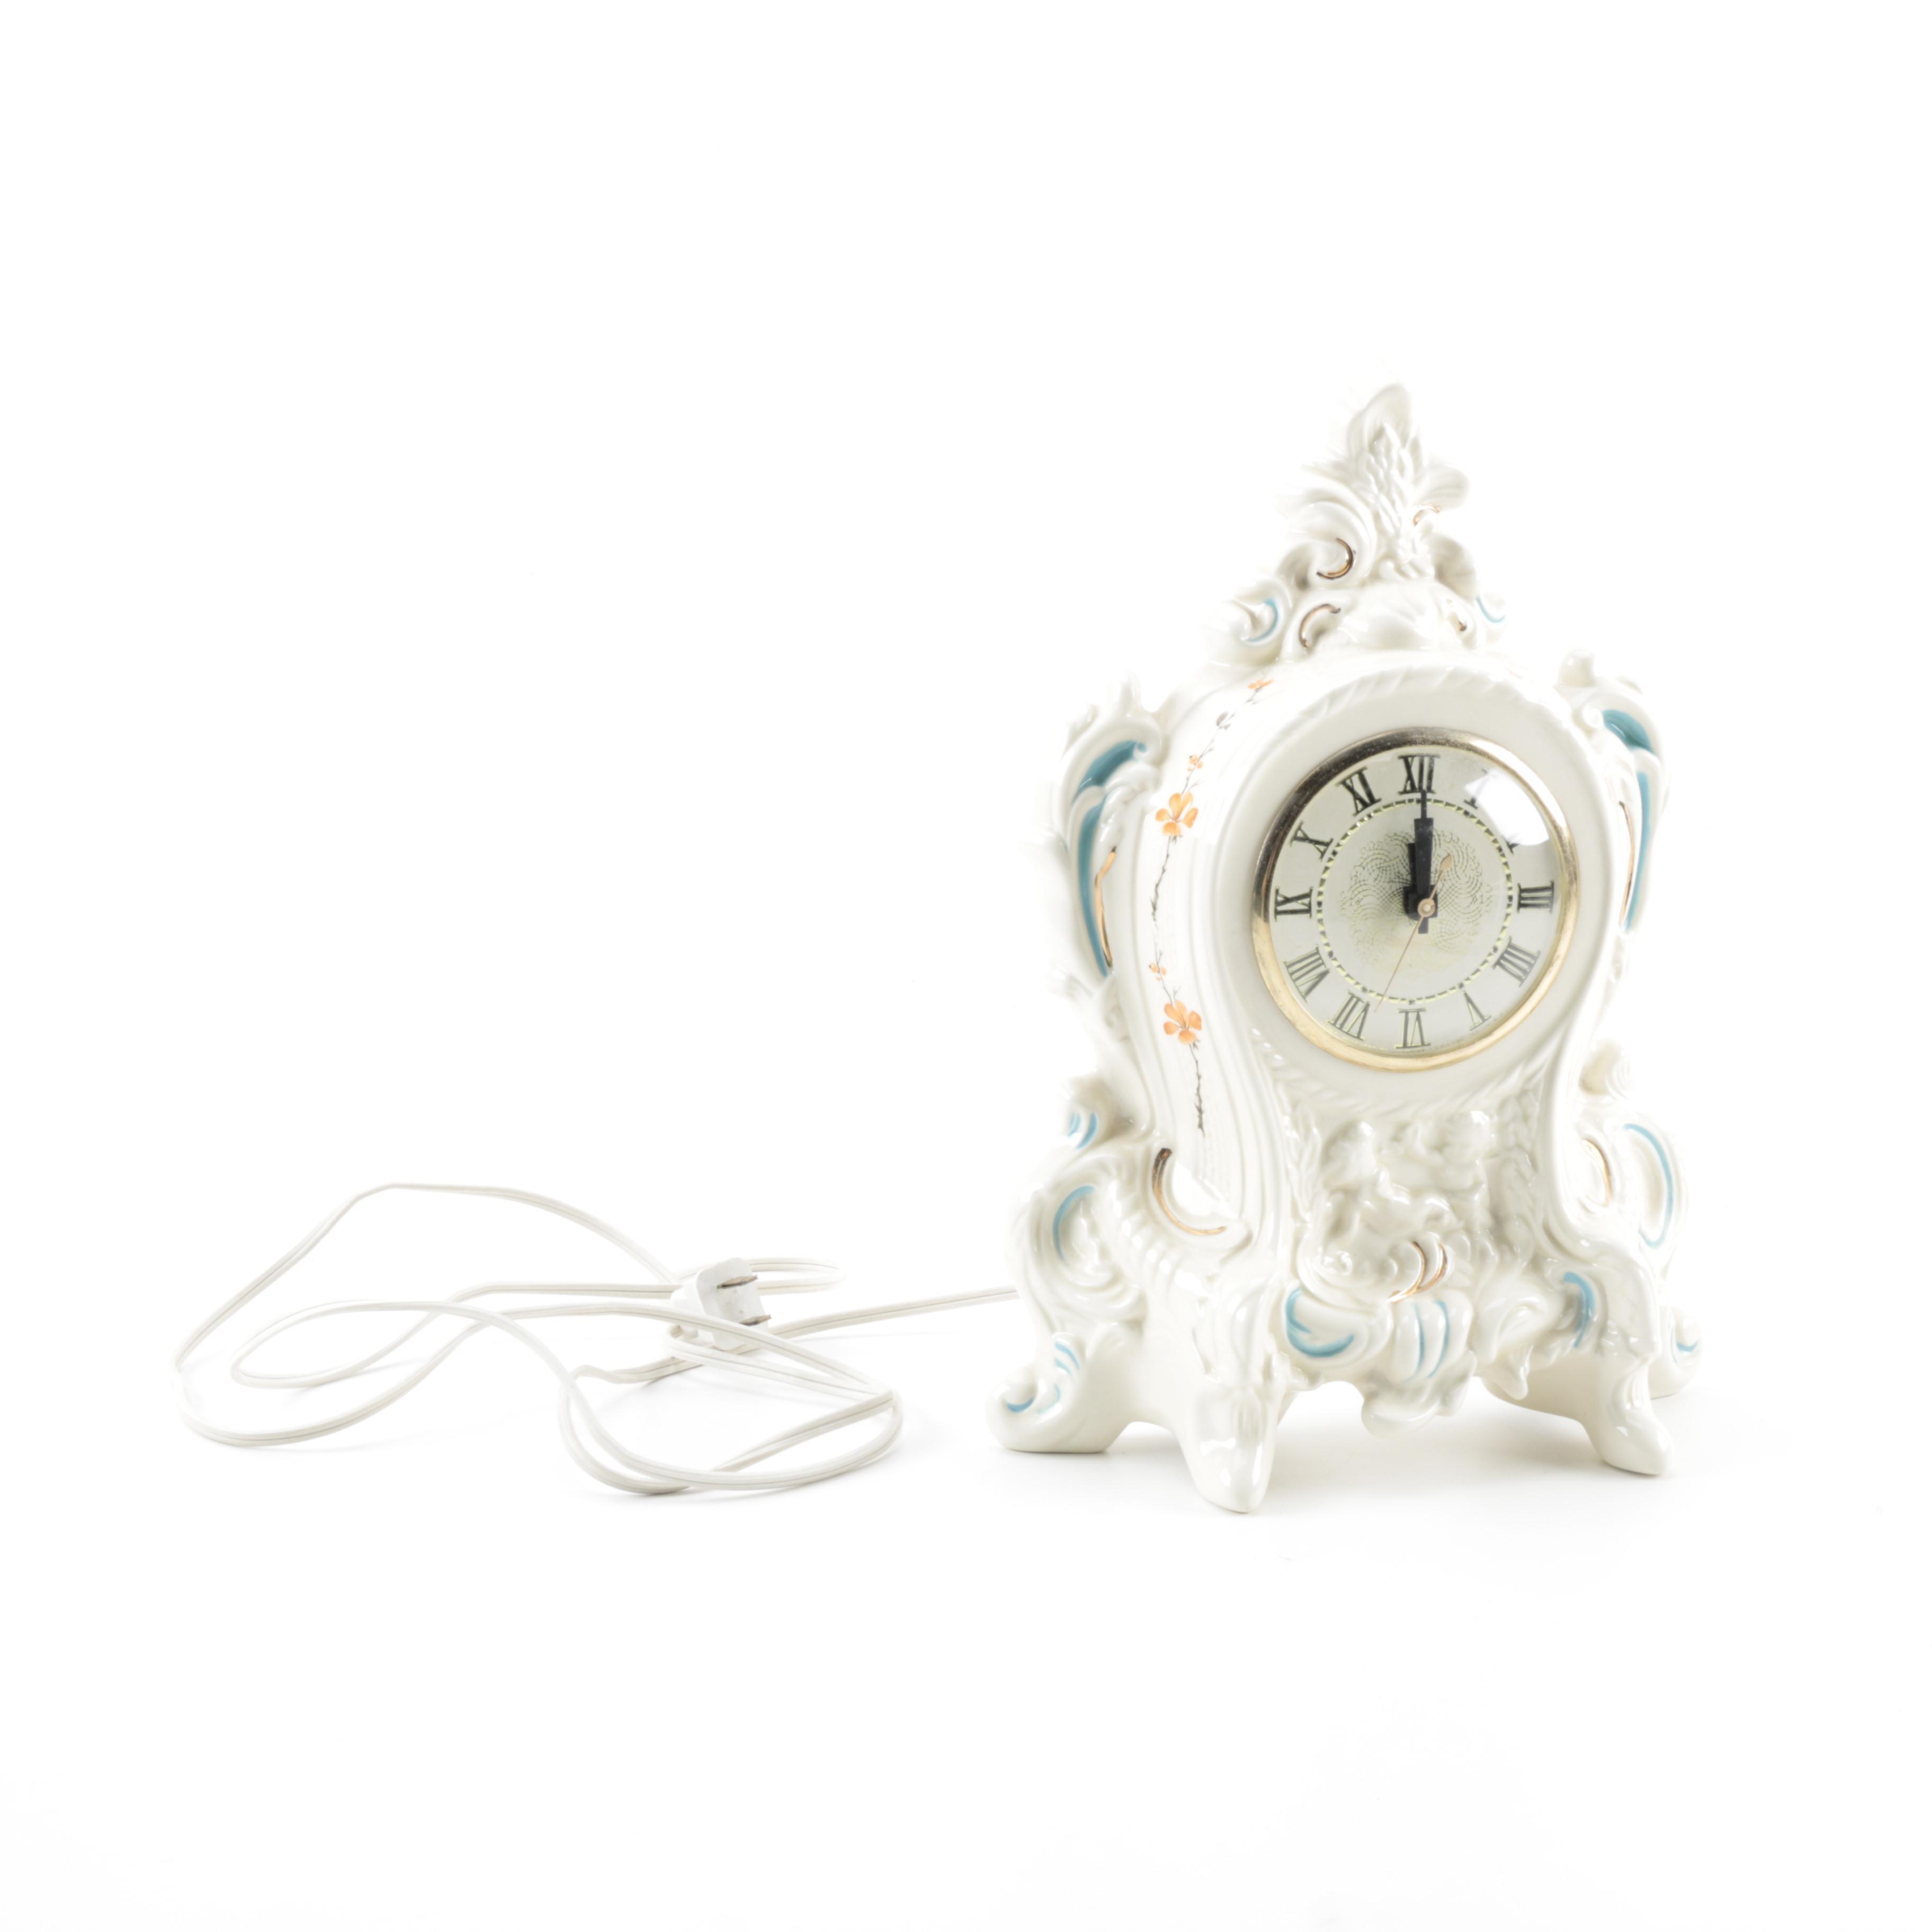 Vintage Lanshire Mantel Clock